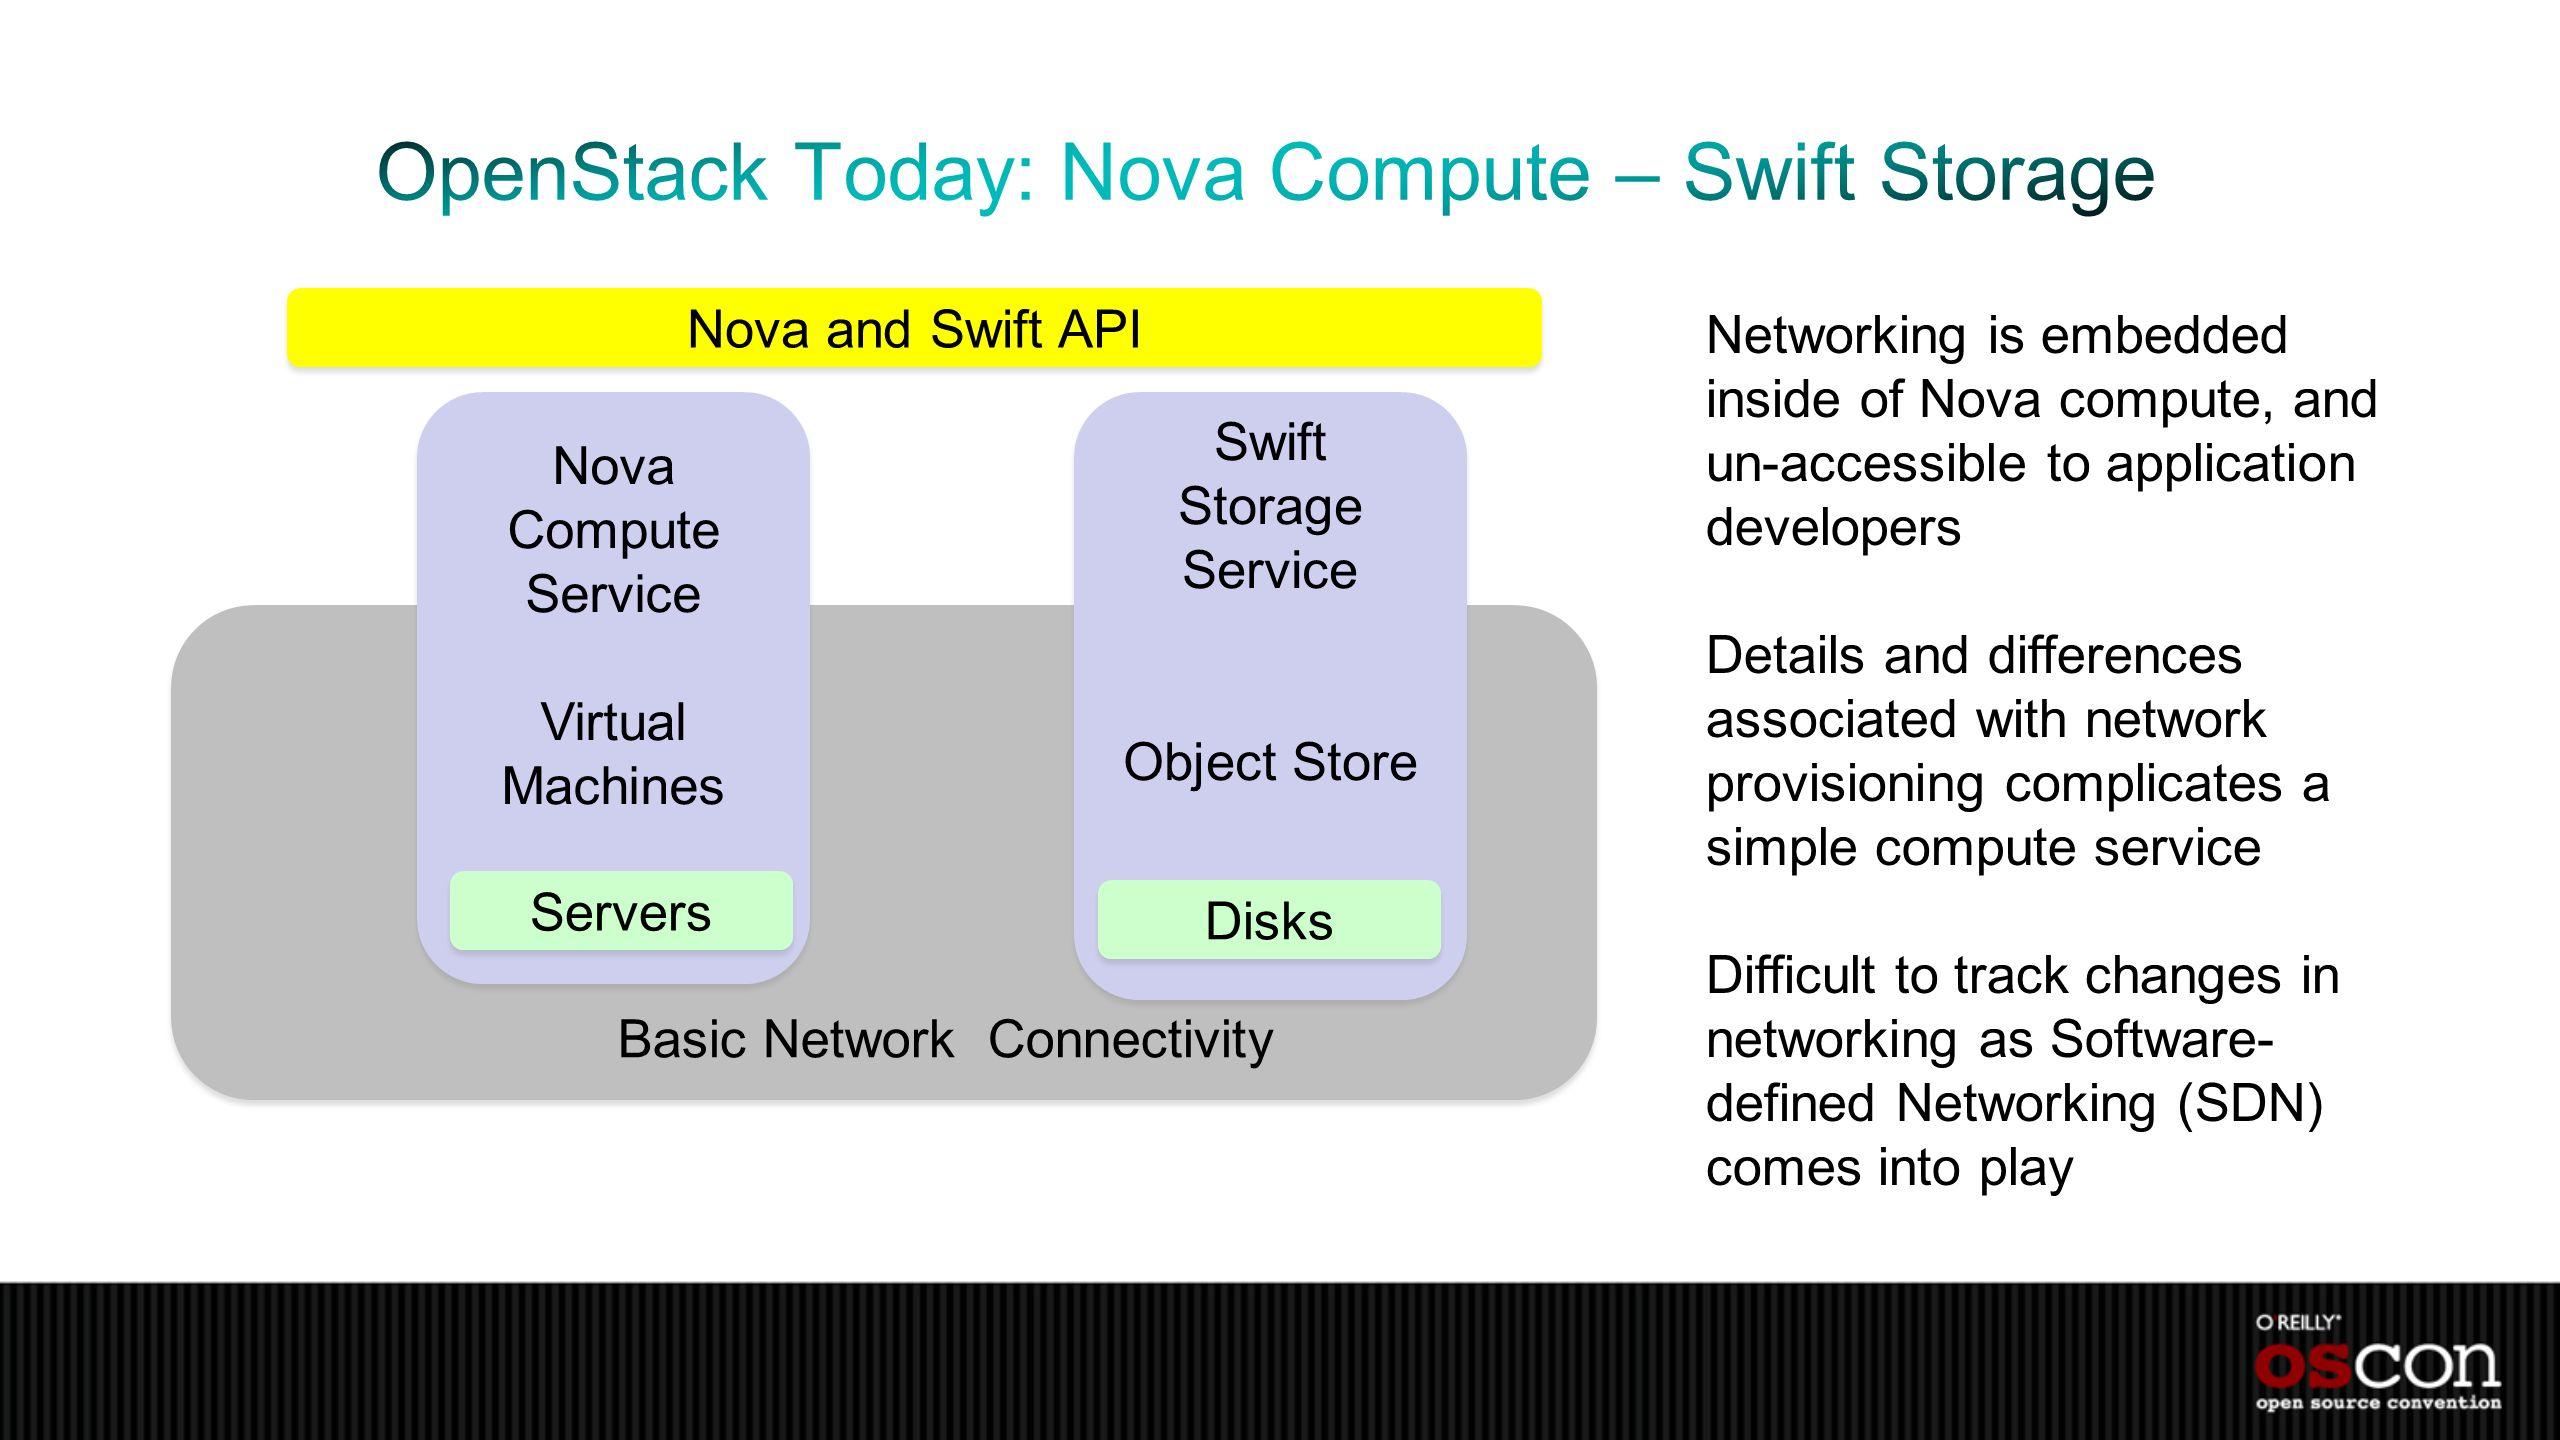 Nova Compute Service Virtual Machines Nova Compute Service Virtual Machines Swift Storage Service Object Store Swift Storage Service Object Store Basi